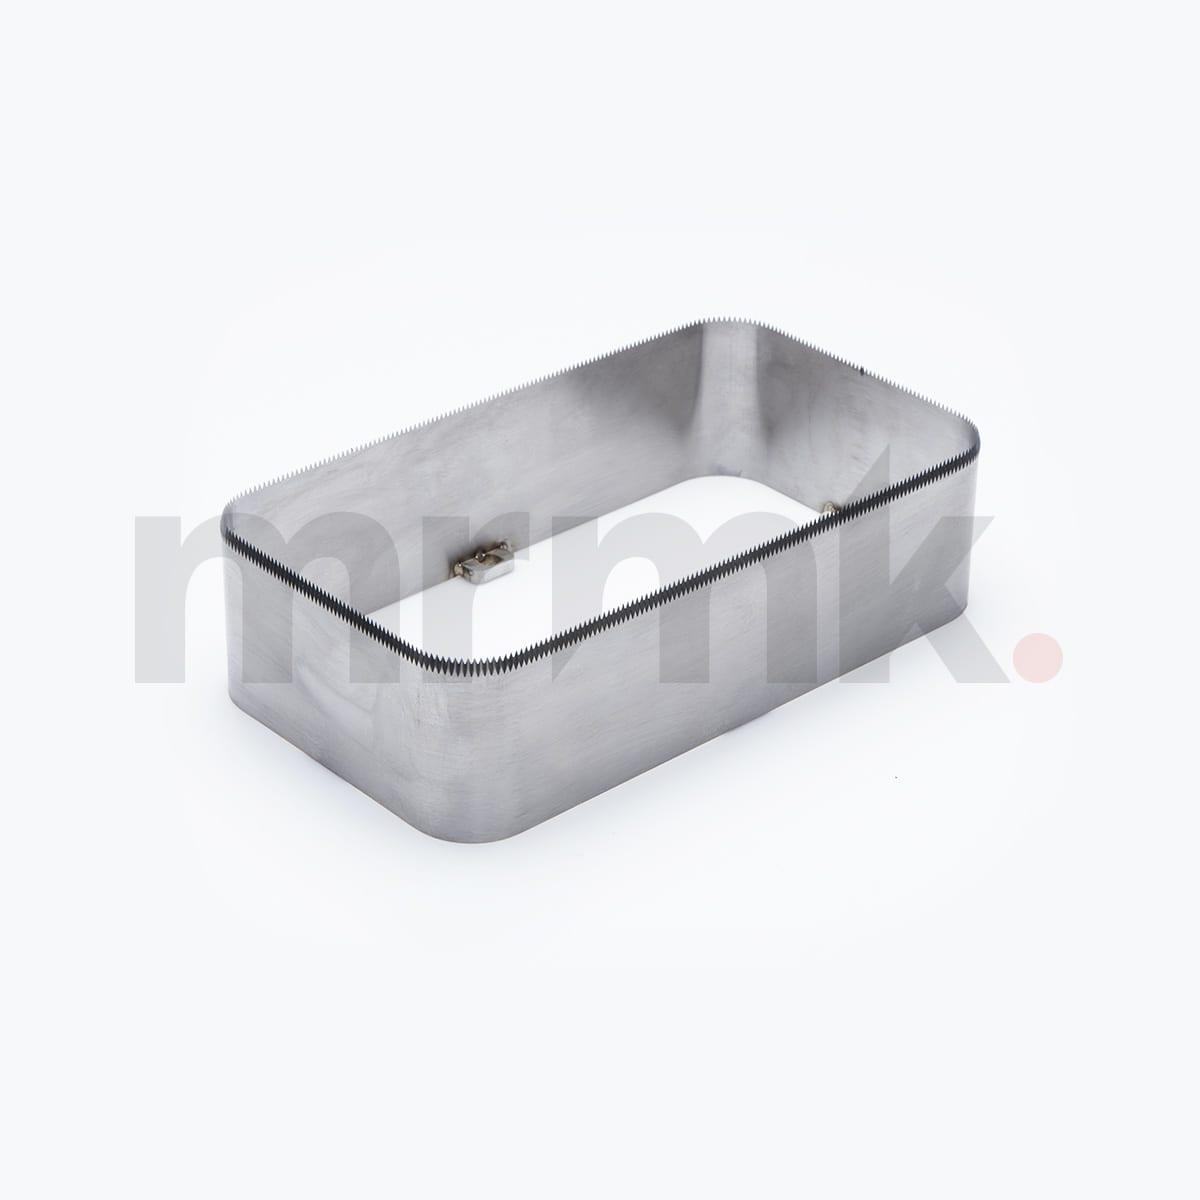 ULMA Compatible Tray Seal Knife